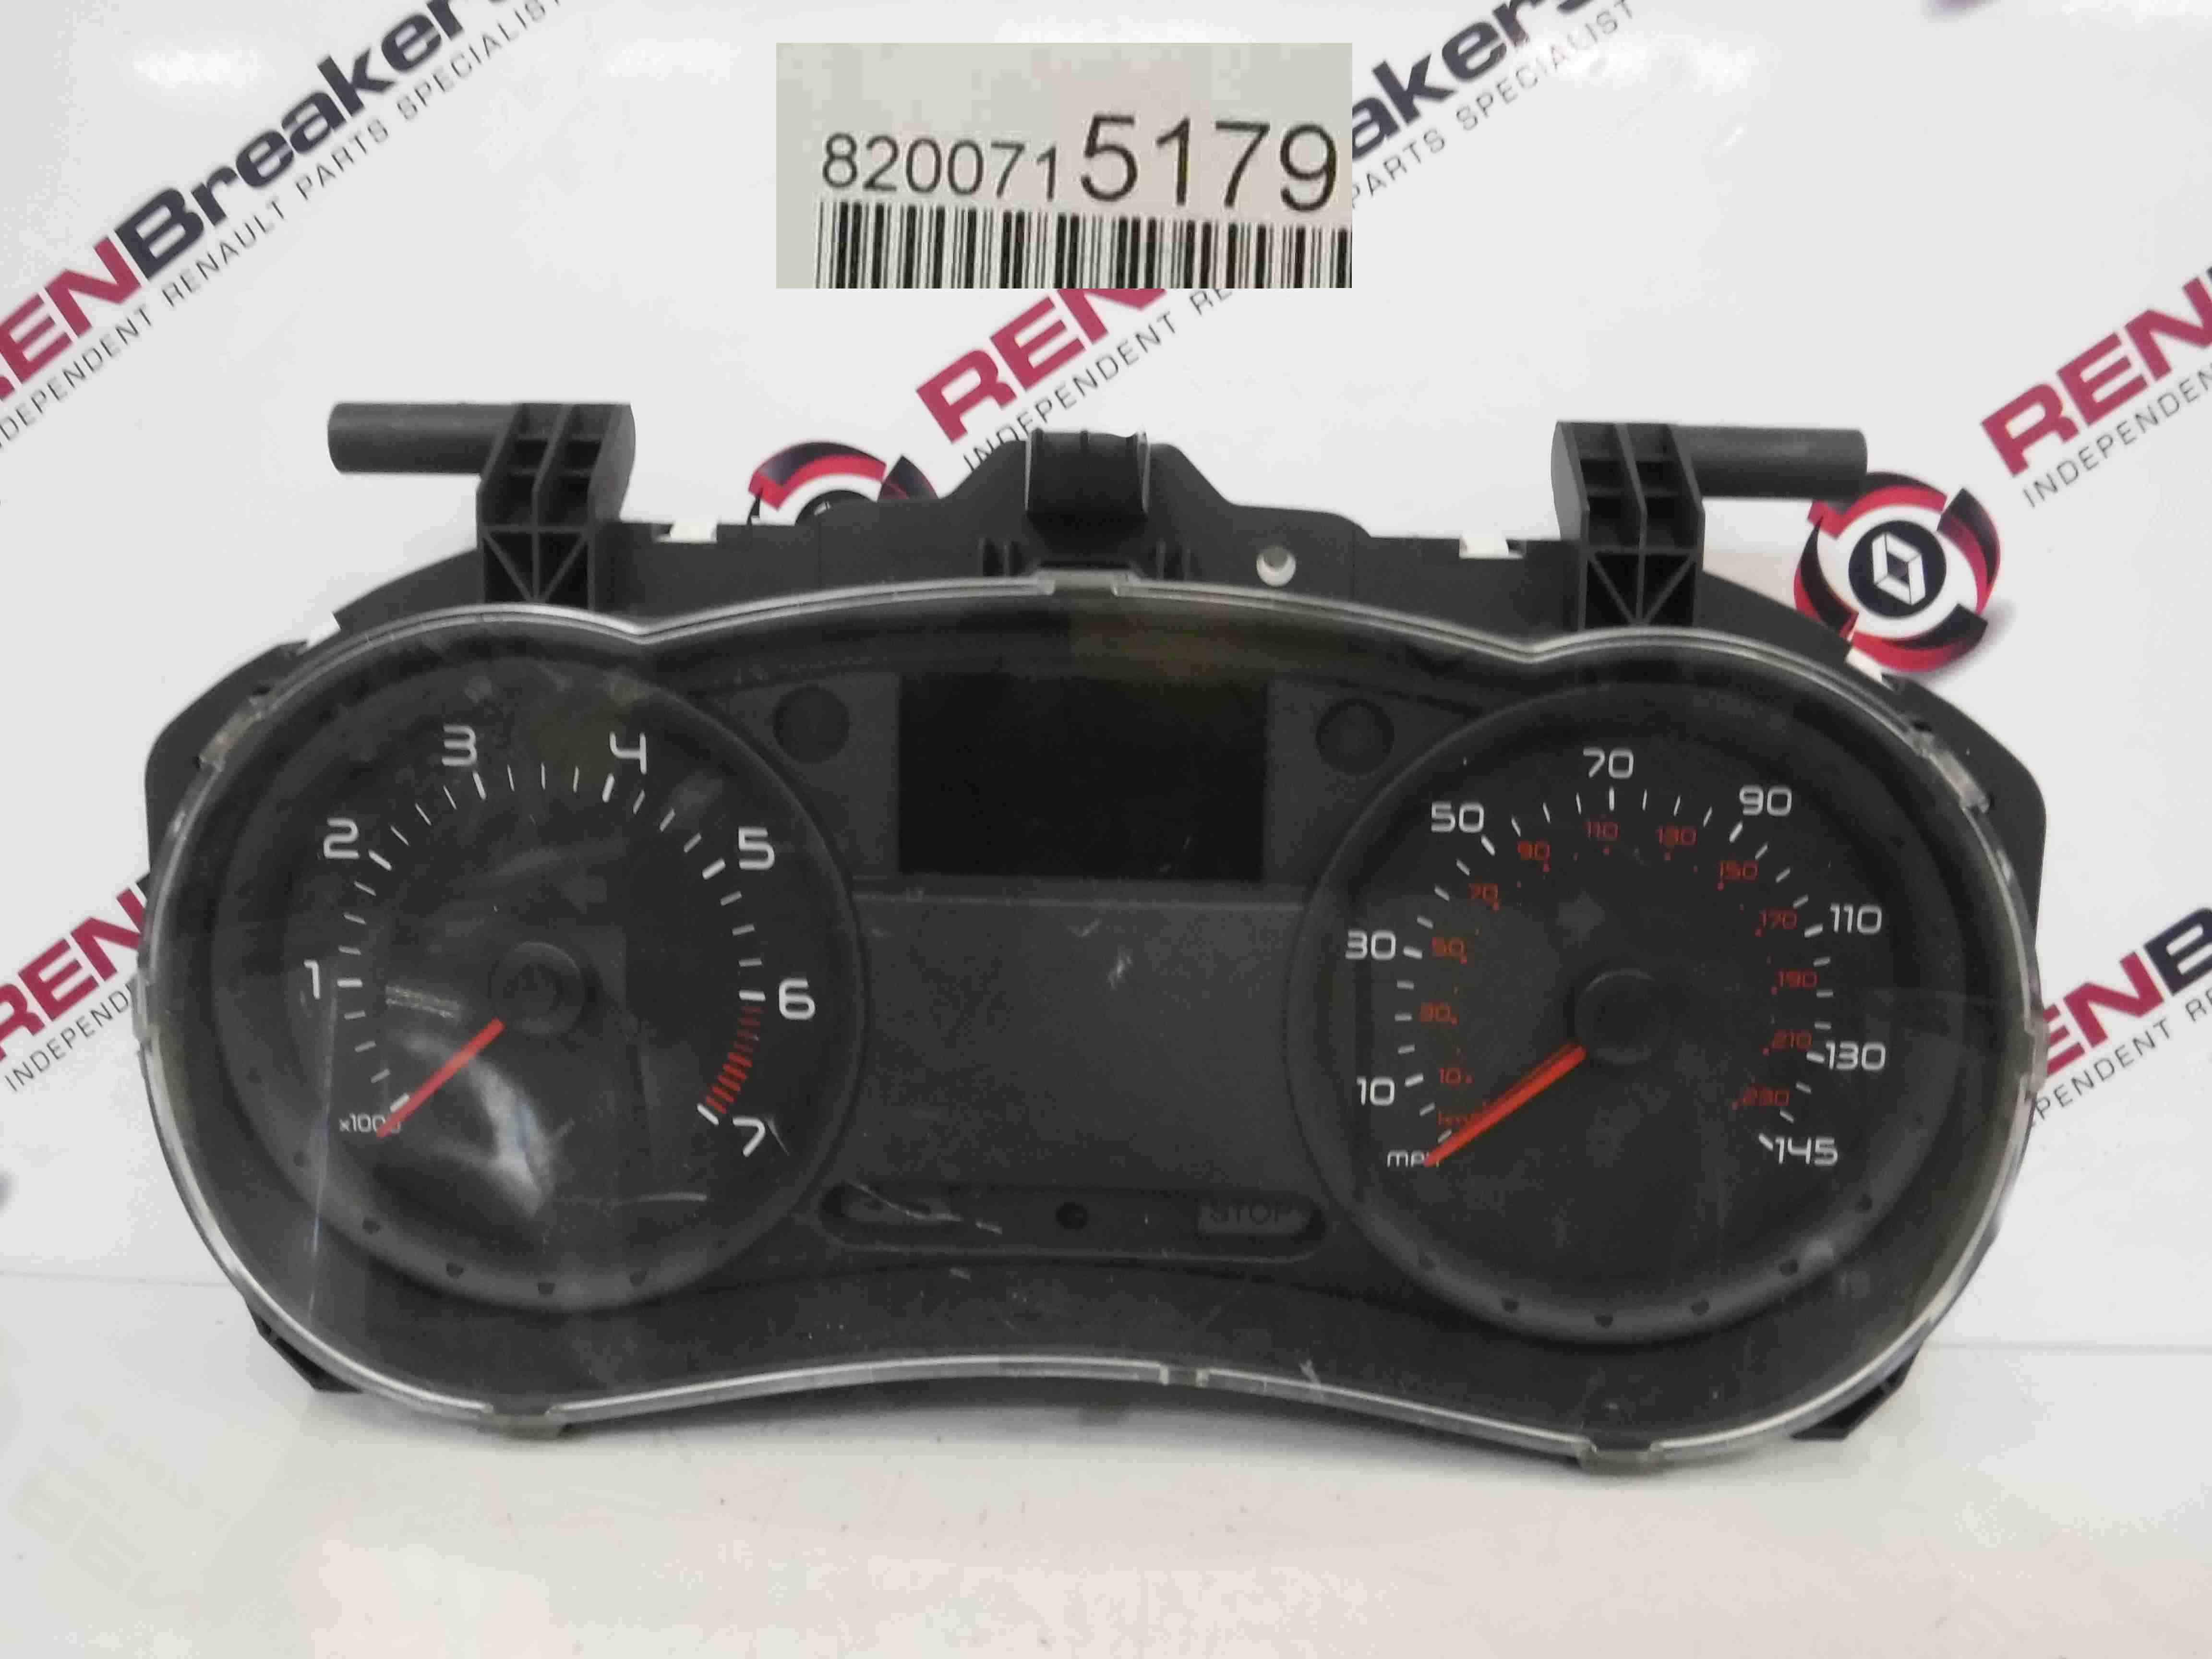 Renault Clio MK3 2005-2012 Instrument Panel Dials Gauges Clocks 109k 8200715179